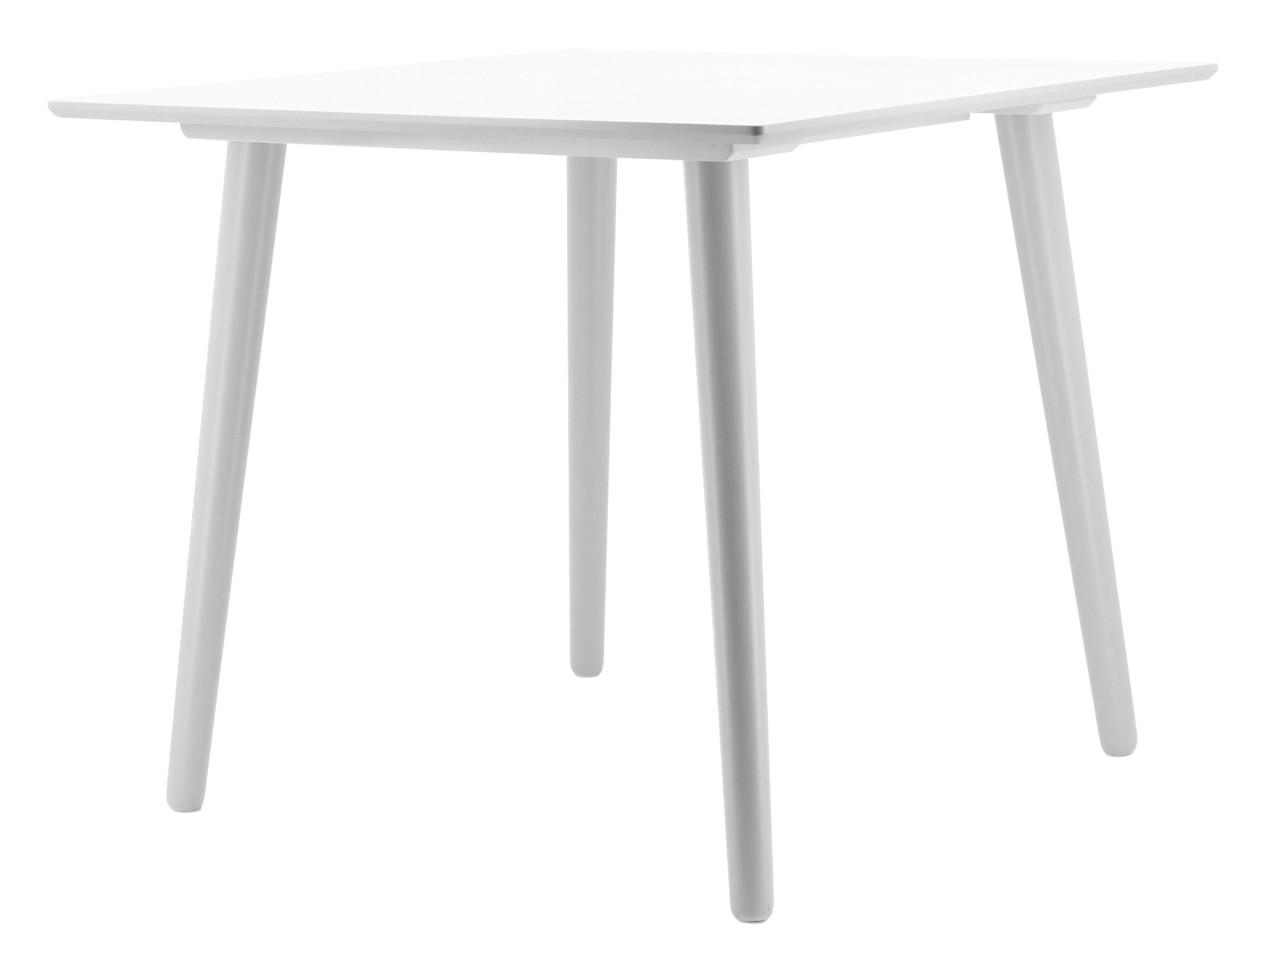 https://designonline24.be/media/catalog/product/b/y/by-boo-eettafel-sublime-90-cm-wit-1.jpg